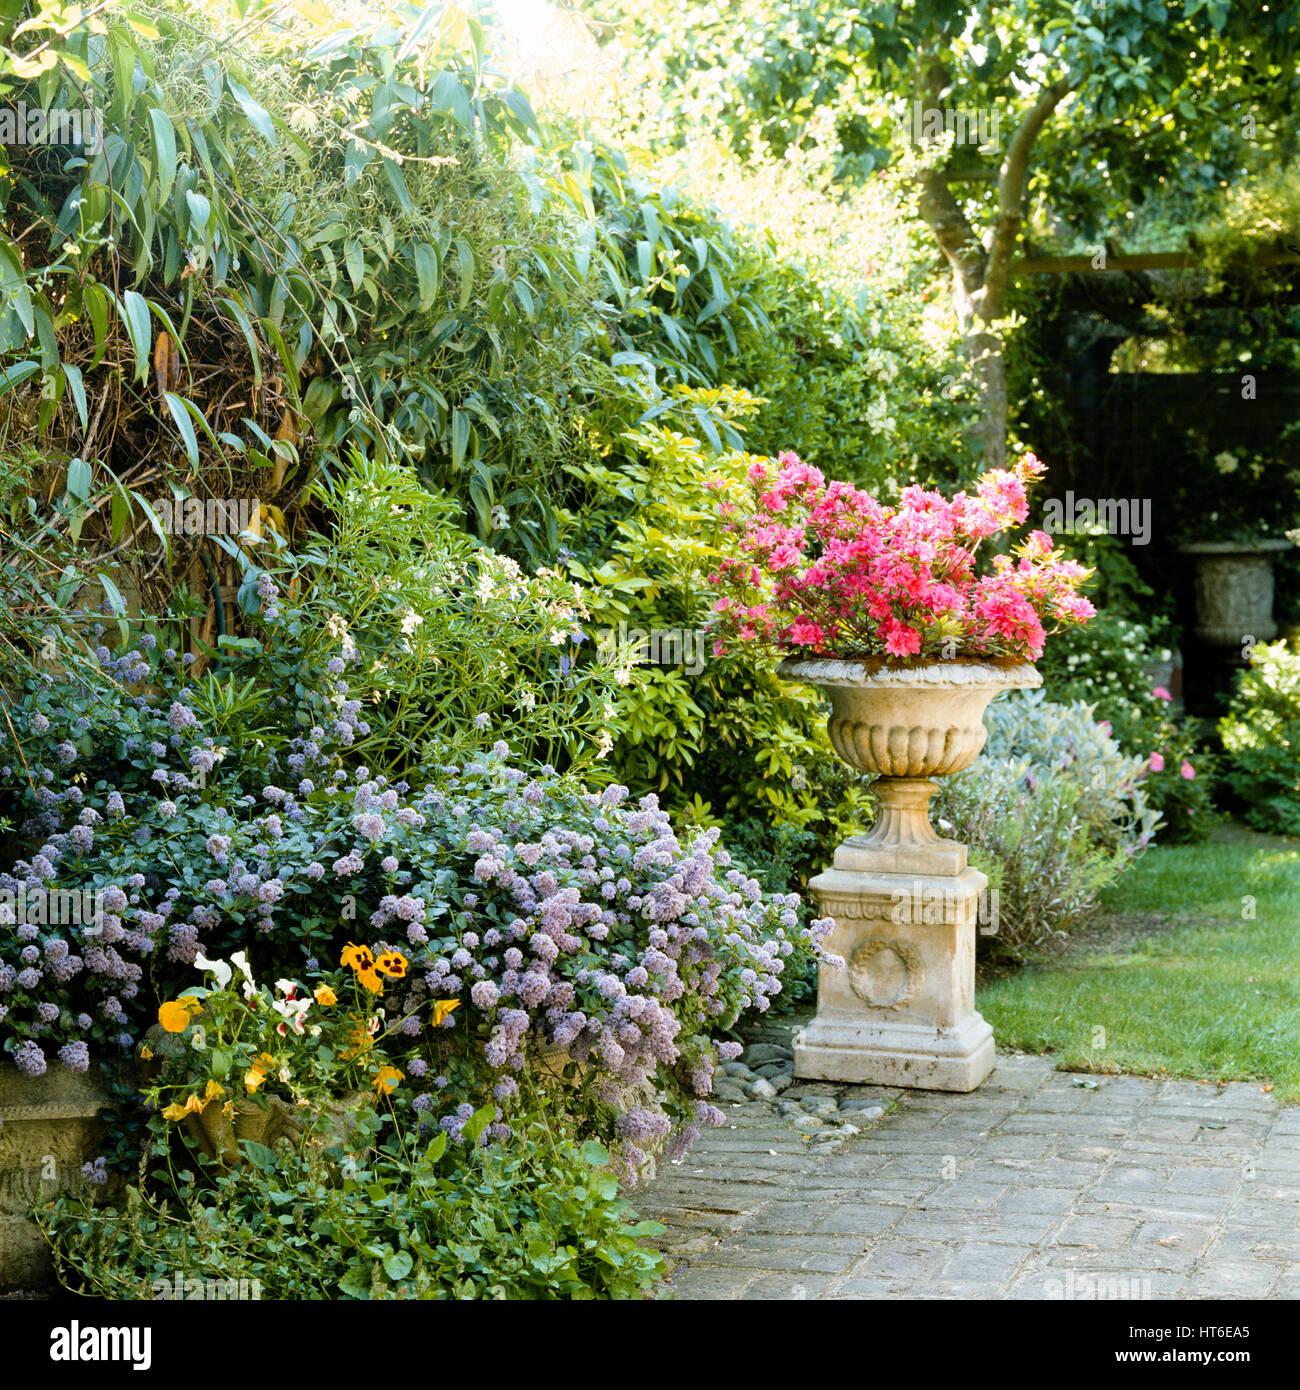 Garden. - Stock Image